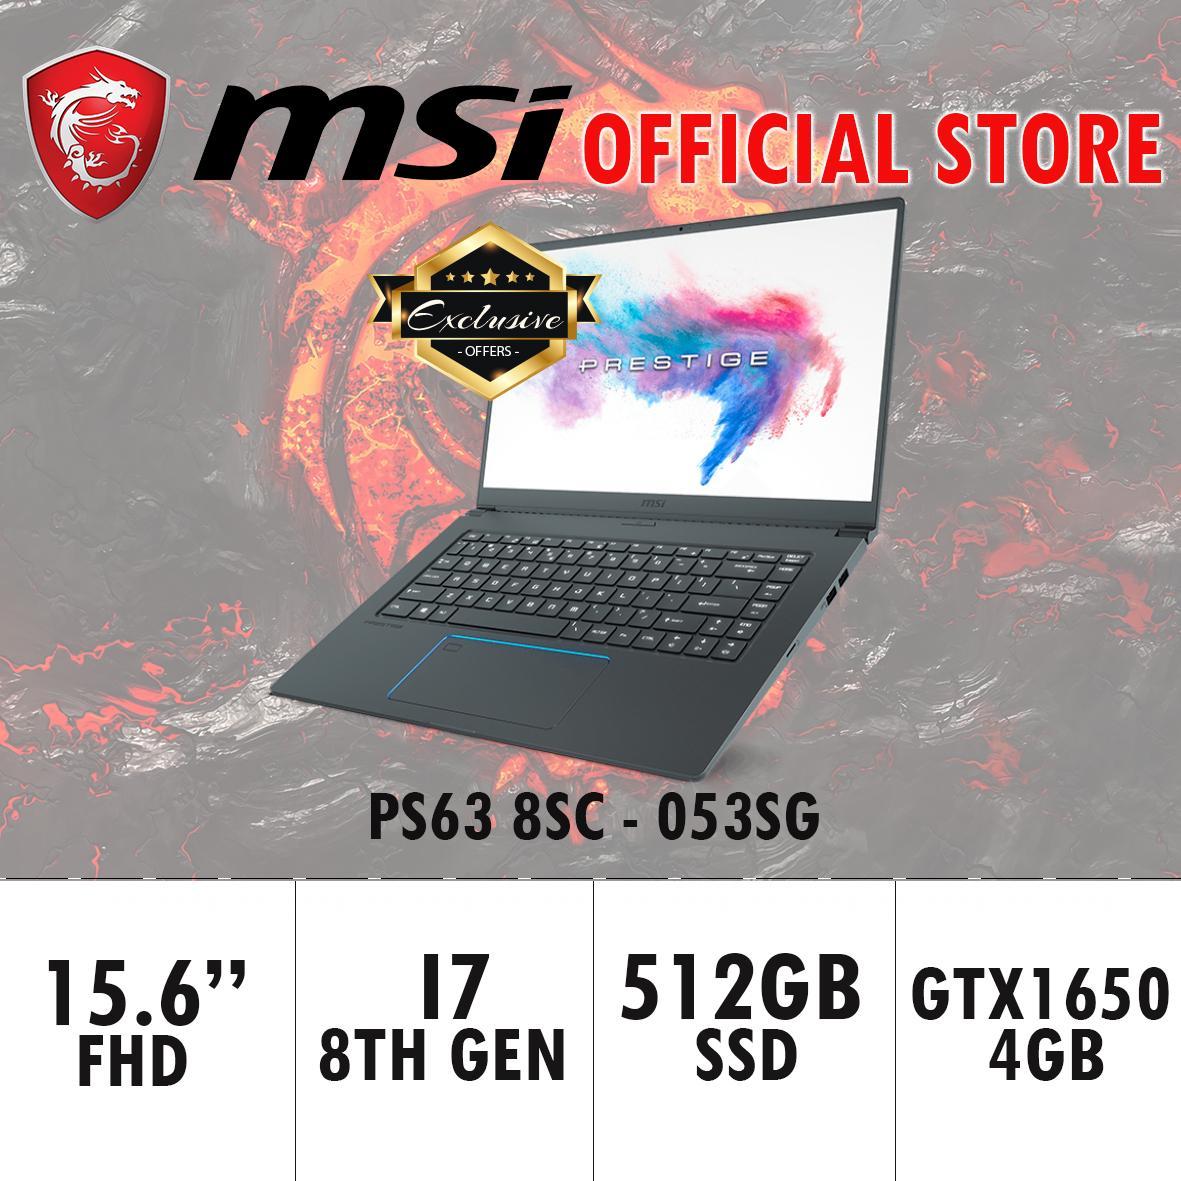 MSI PS63 GTX1650 8SC – 053SG EXCLUSIVE (i7-8565U / 16GB / 512GB SSD / WIN 10) 15.6 FHD Gaming Laptop